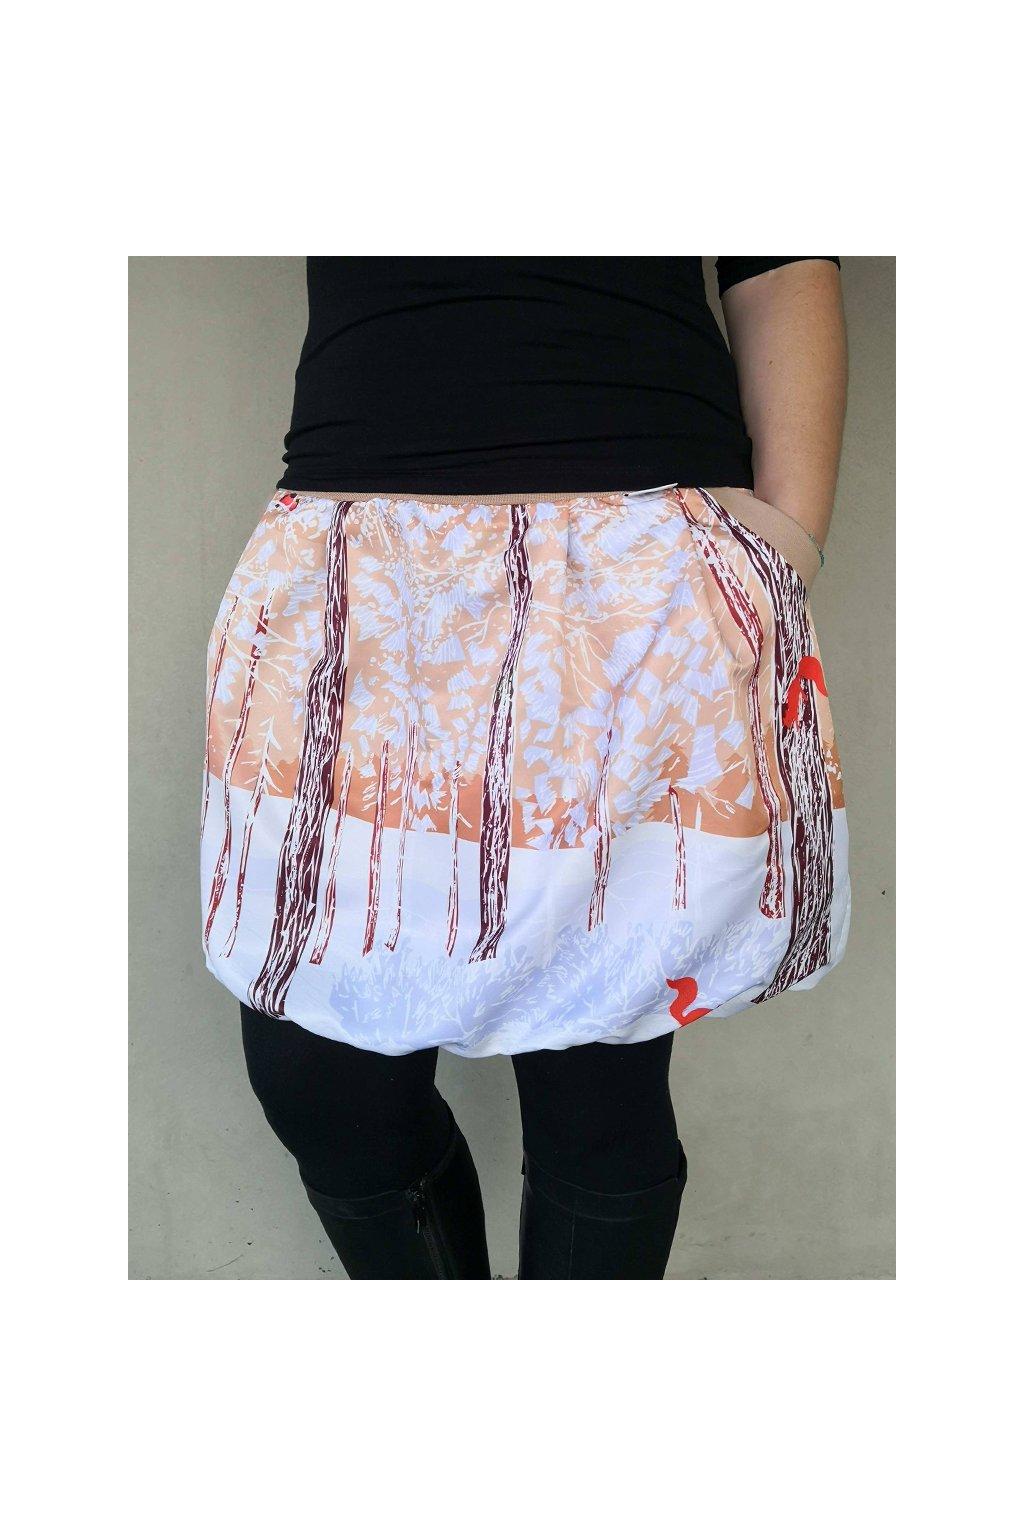 balonova sukne veverky papilio clothing